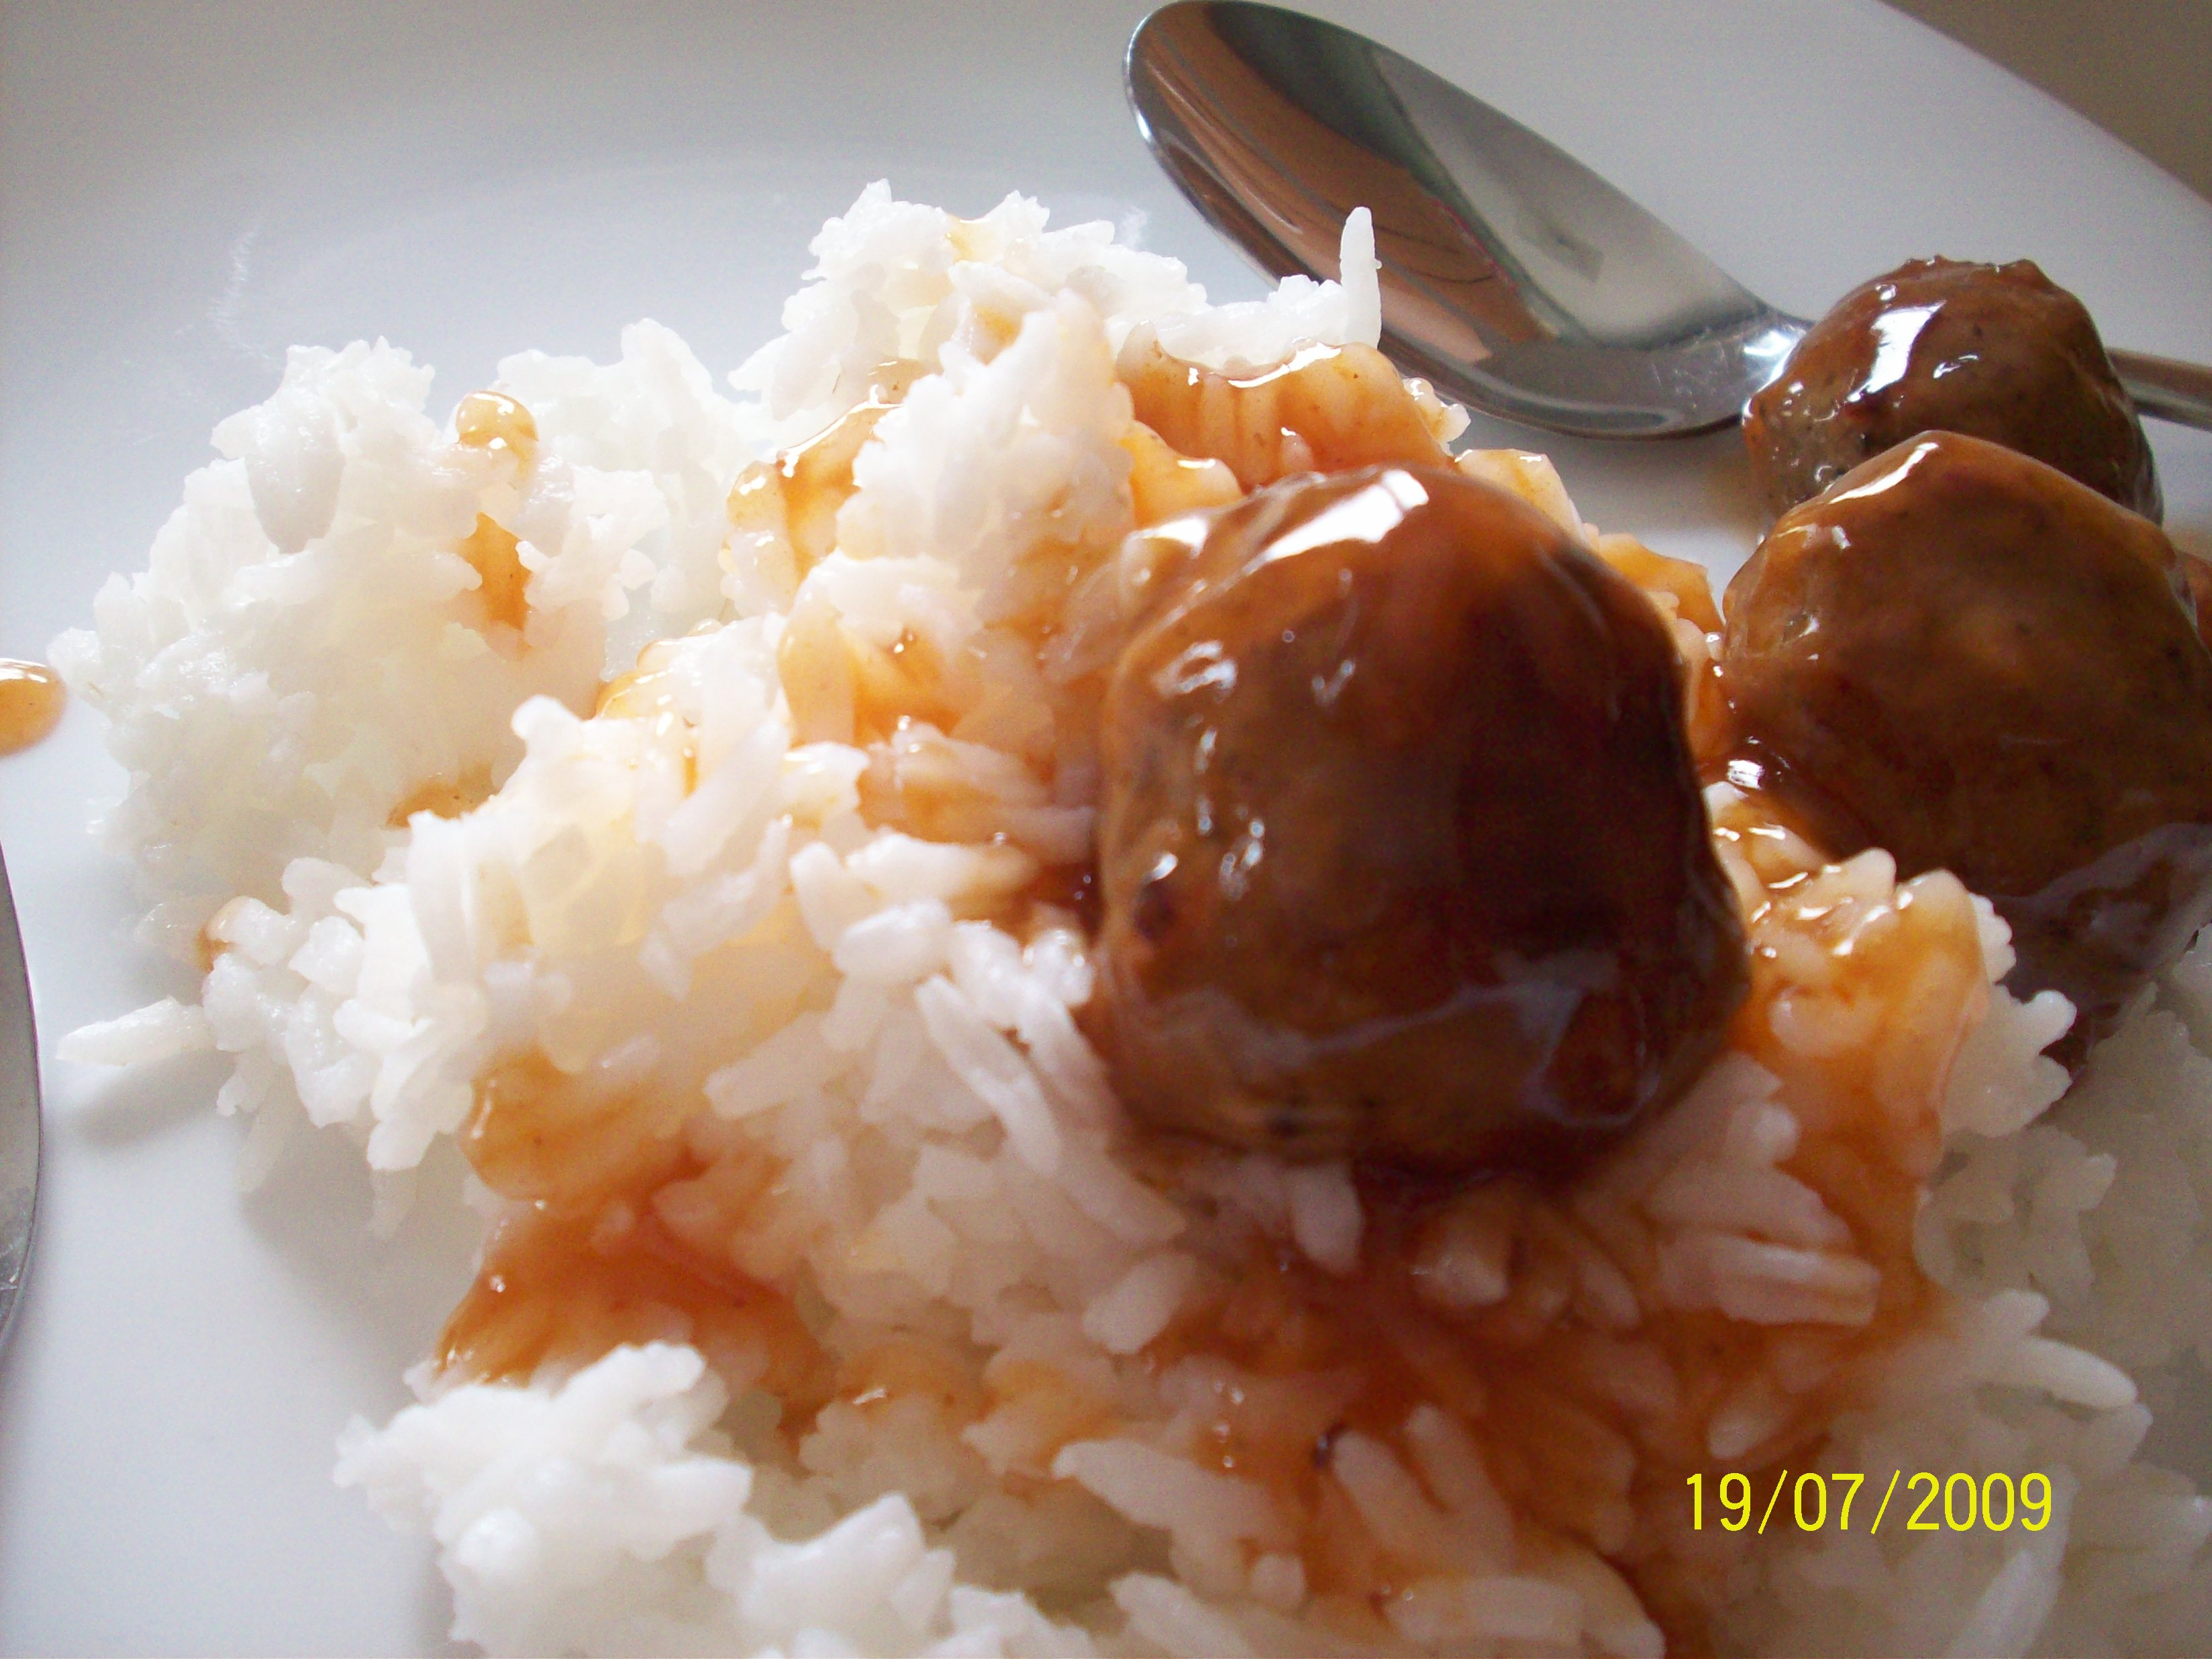 https://foodloader.net/cutie_2009-07-19_Meatballs.jpg